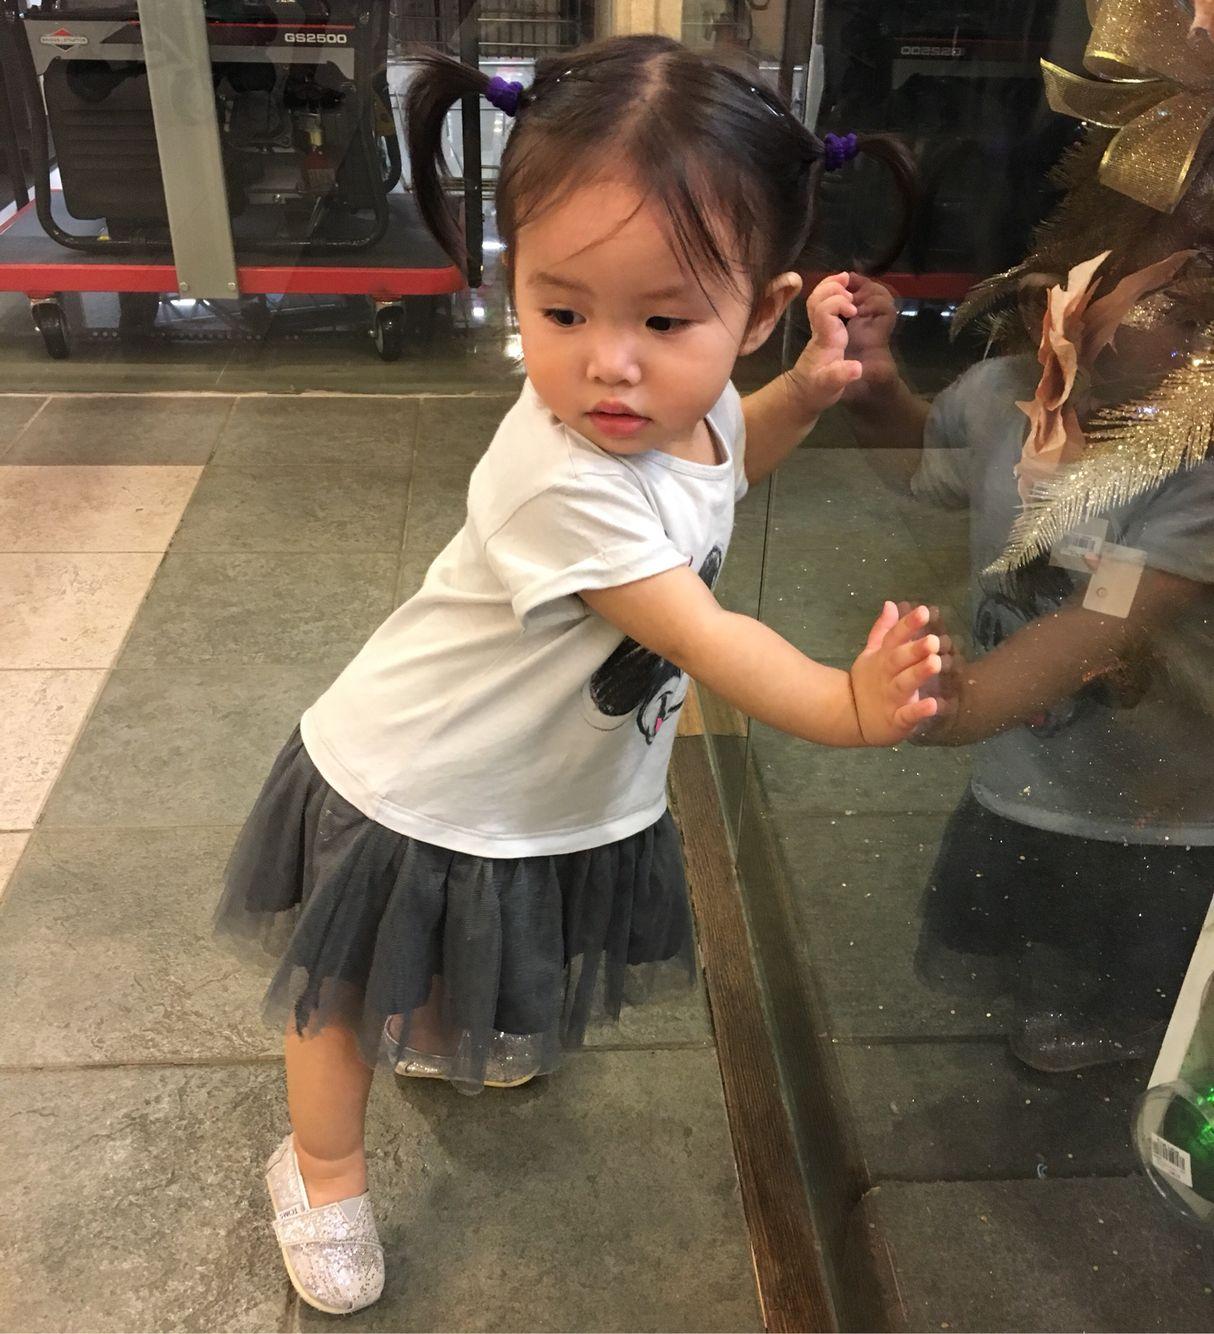 Is my foot pointy enough? #littleradgirl #ootd #fashionkids #kidsfashion